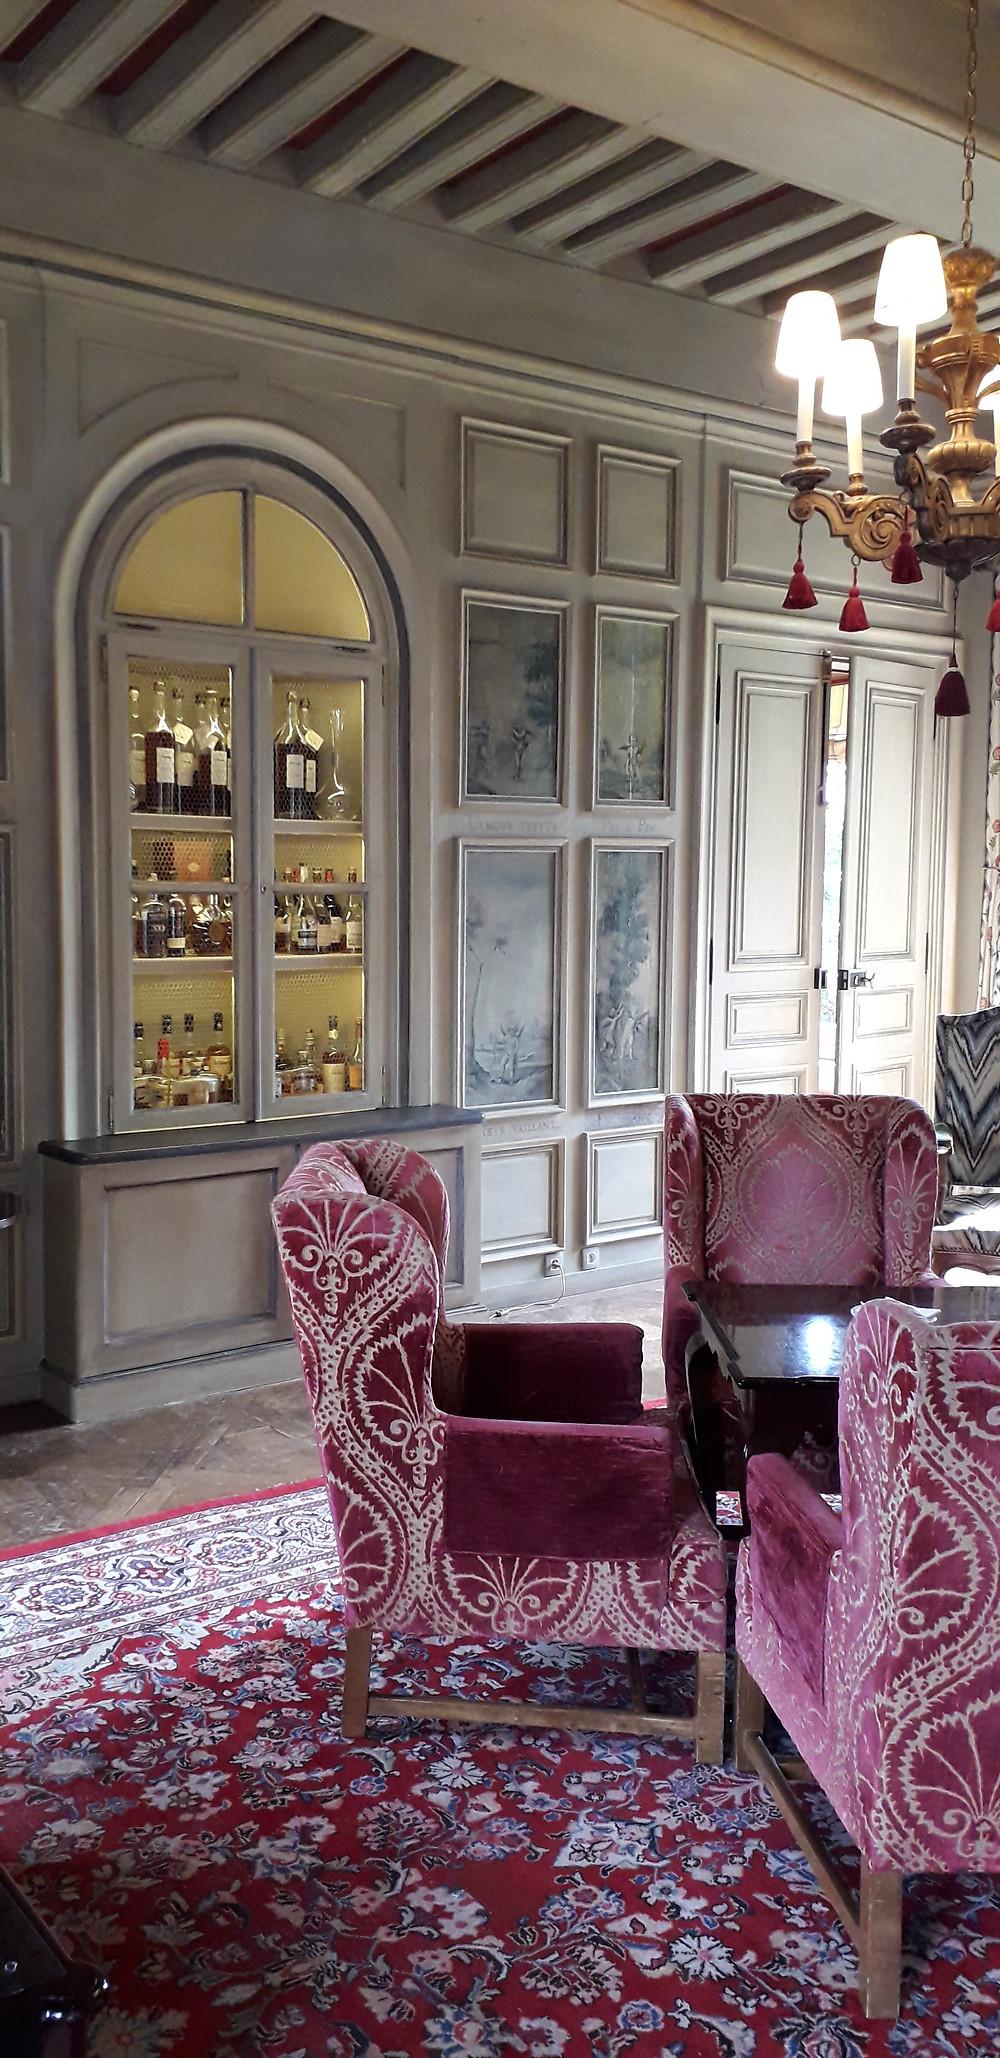 seminars well being wine tasting initiation La Petite Nenette in Chateau de Courcelles